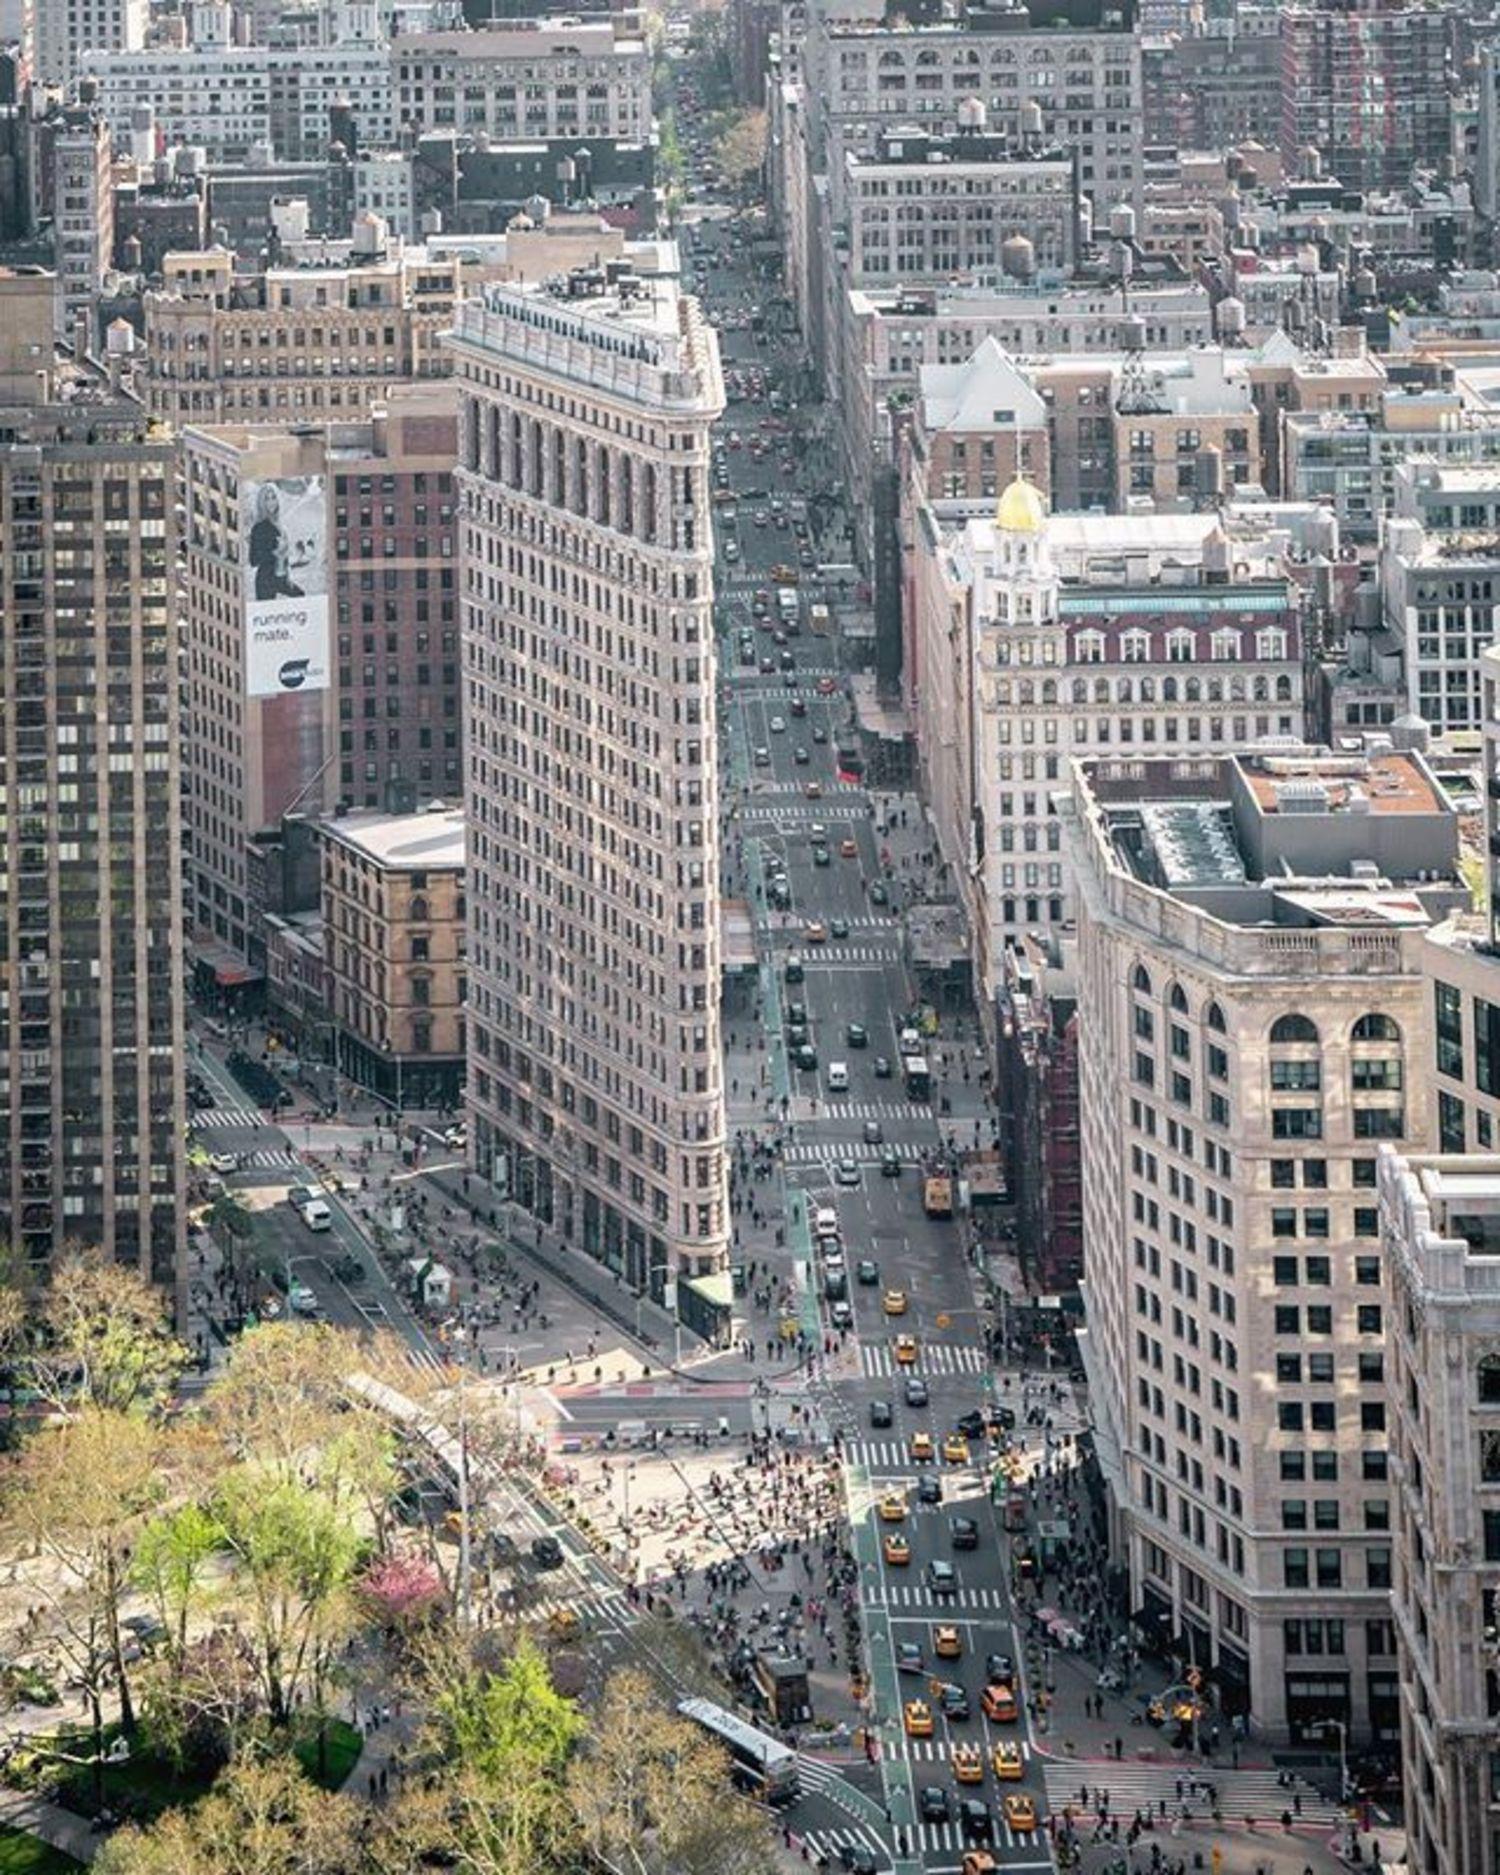 Flatiron Building, New York, New York. Photo via @212sid #viewingnyc #newyorkcity #newyork #nyc